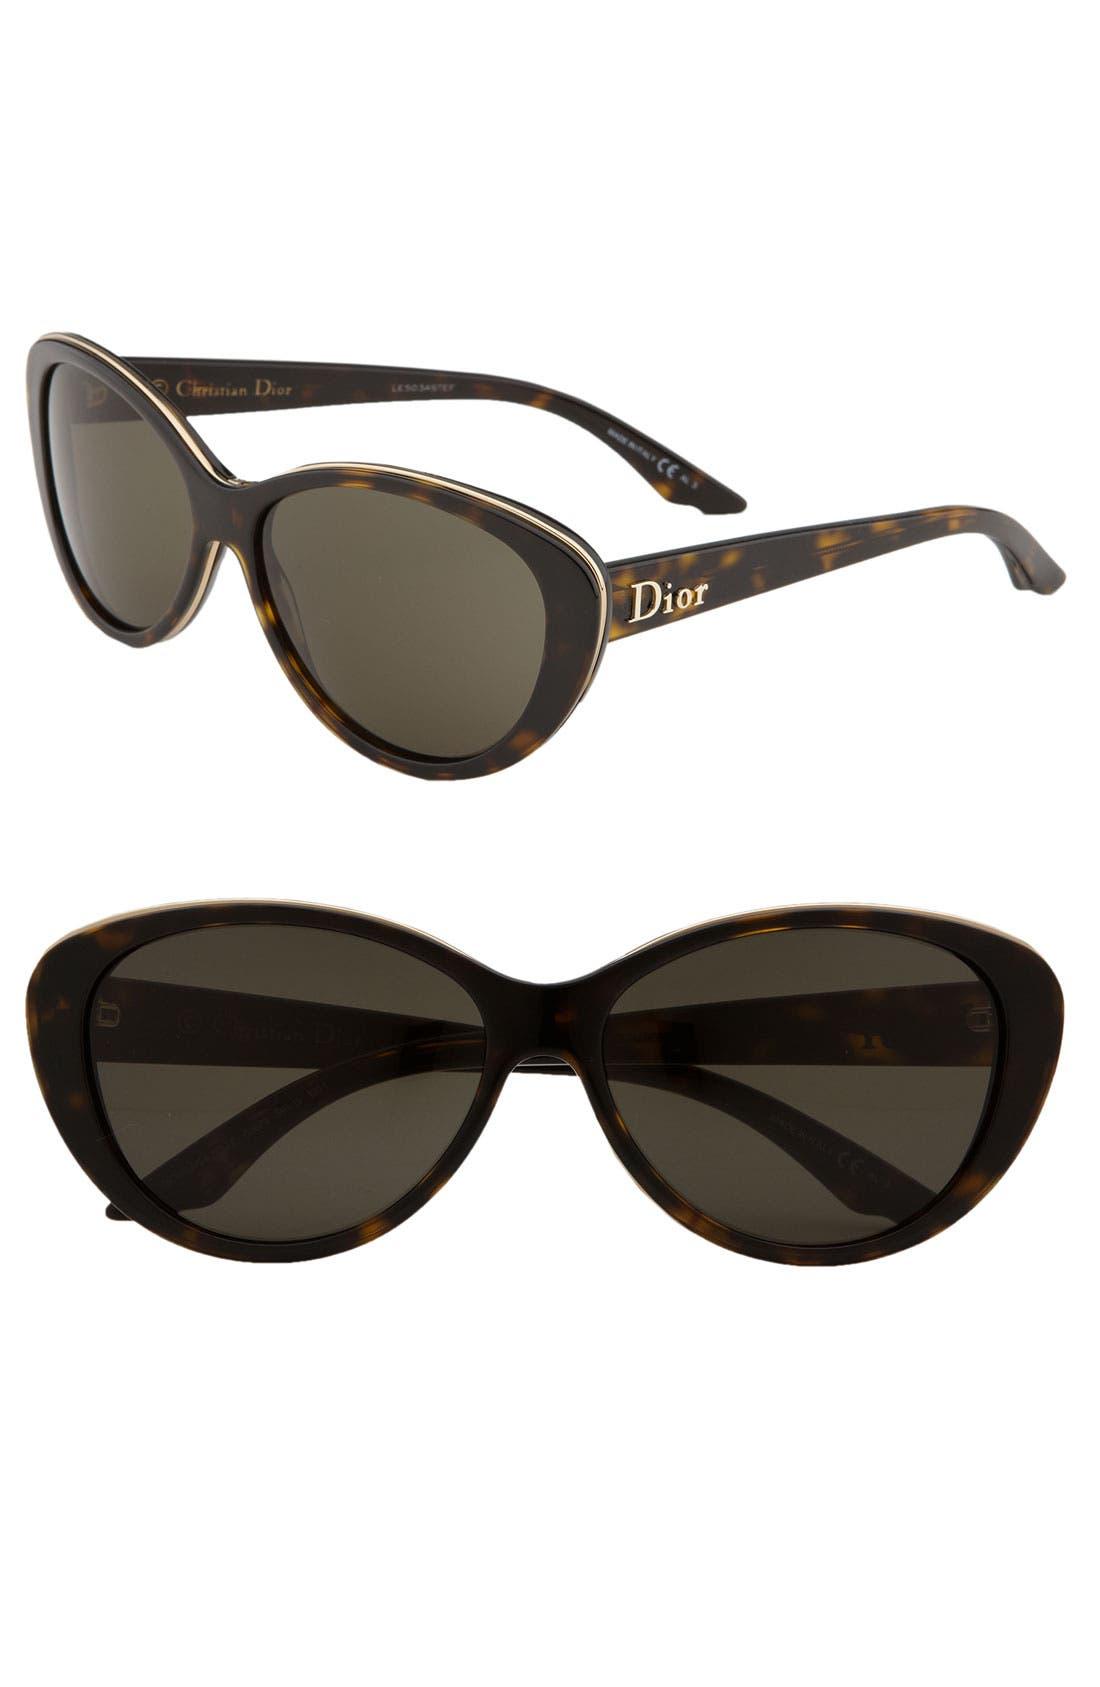 Alternate Image 1 Selected - Dior 'Bagatelle' Retro Inspired Sunglasses